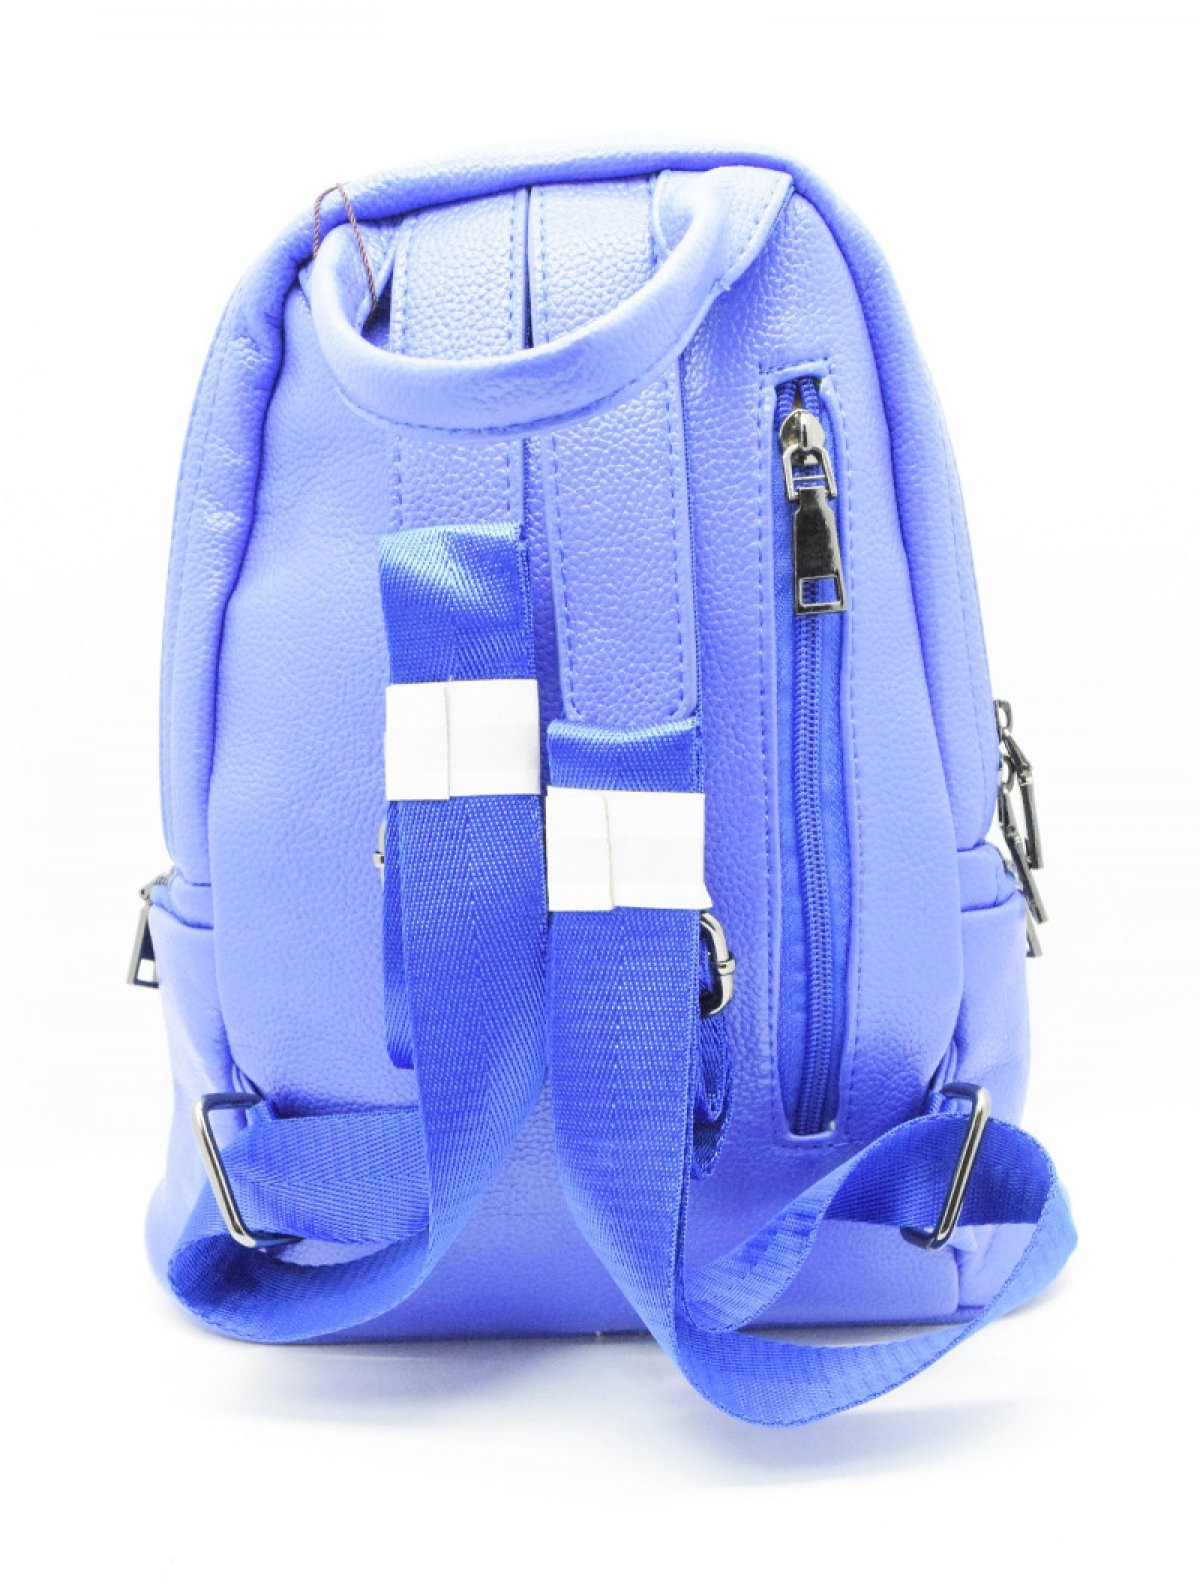 Respect 8828-509 рюкзак синий